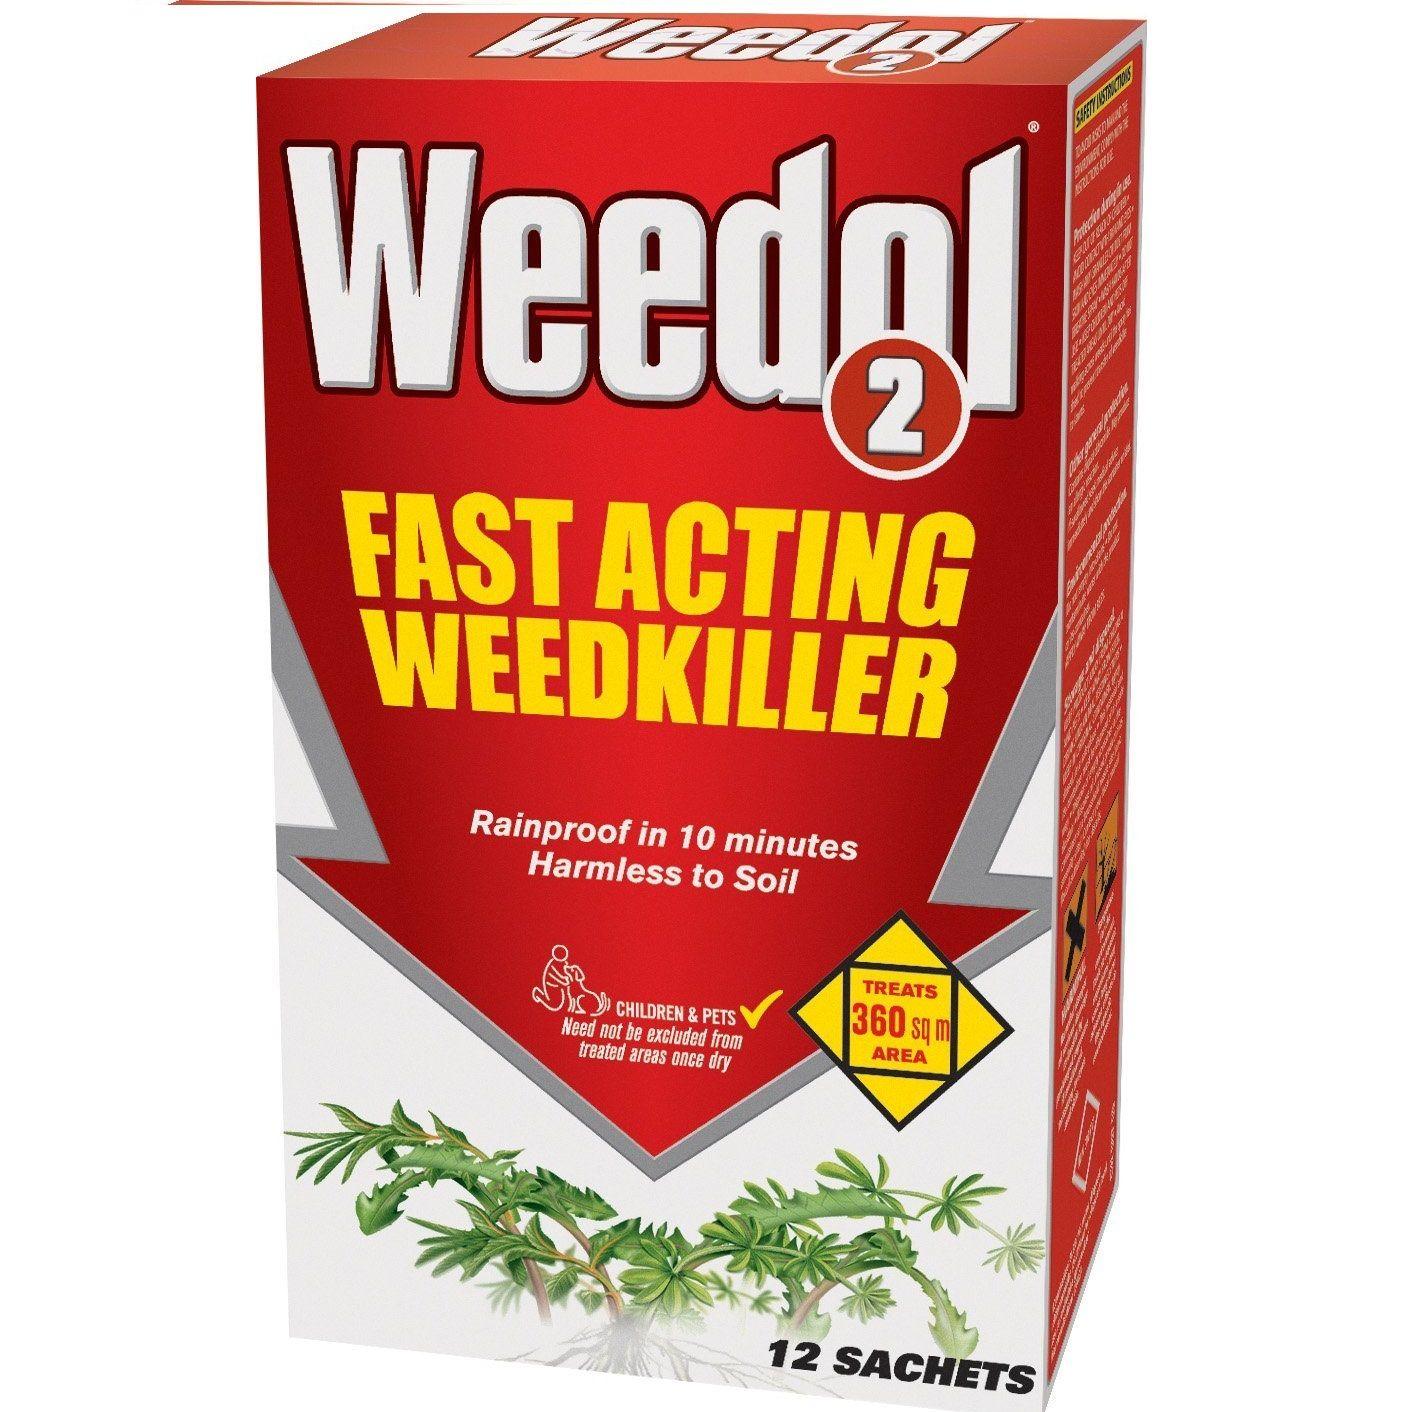 BARGAIN Weedol 2 12 Sachets Granular Concentrate Weedkiller JUST £10.99 At Amazon - Gratisfaction UK Bargains #bargains #garden